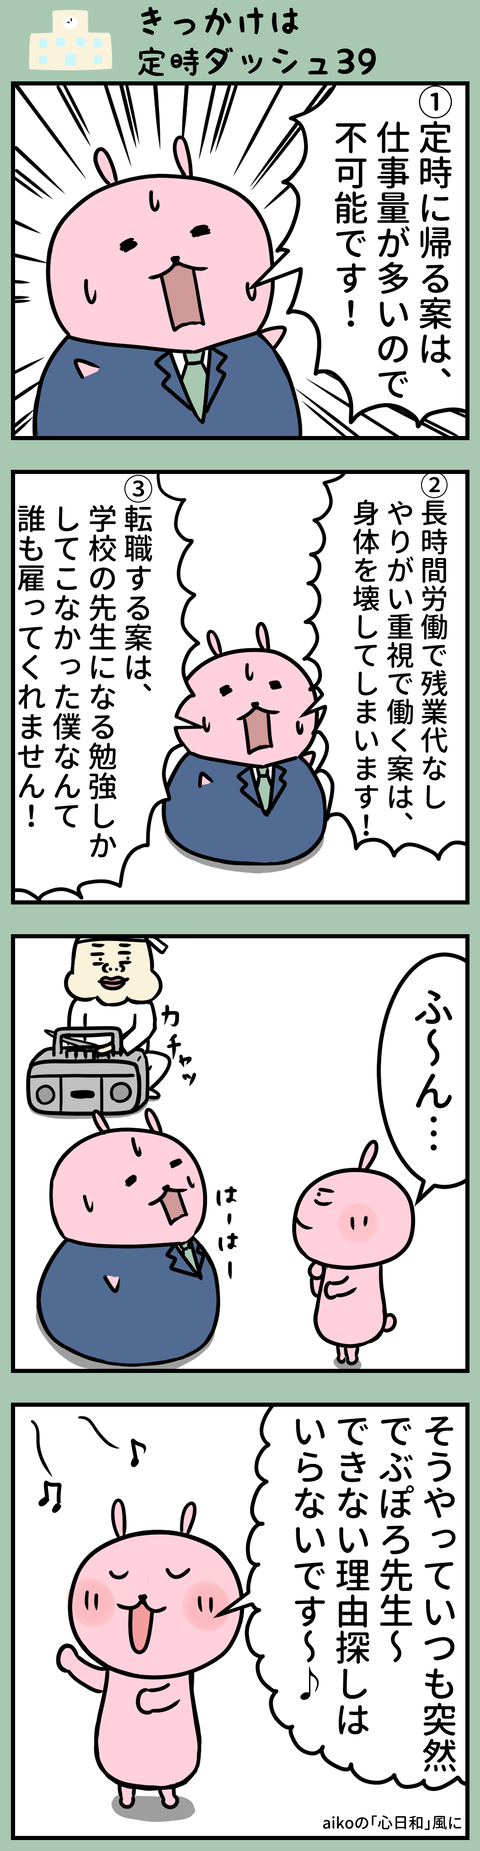 manga-yuzuporo108-1